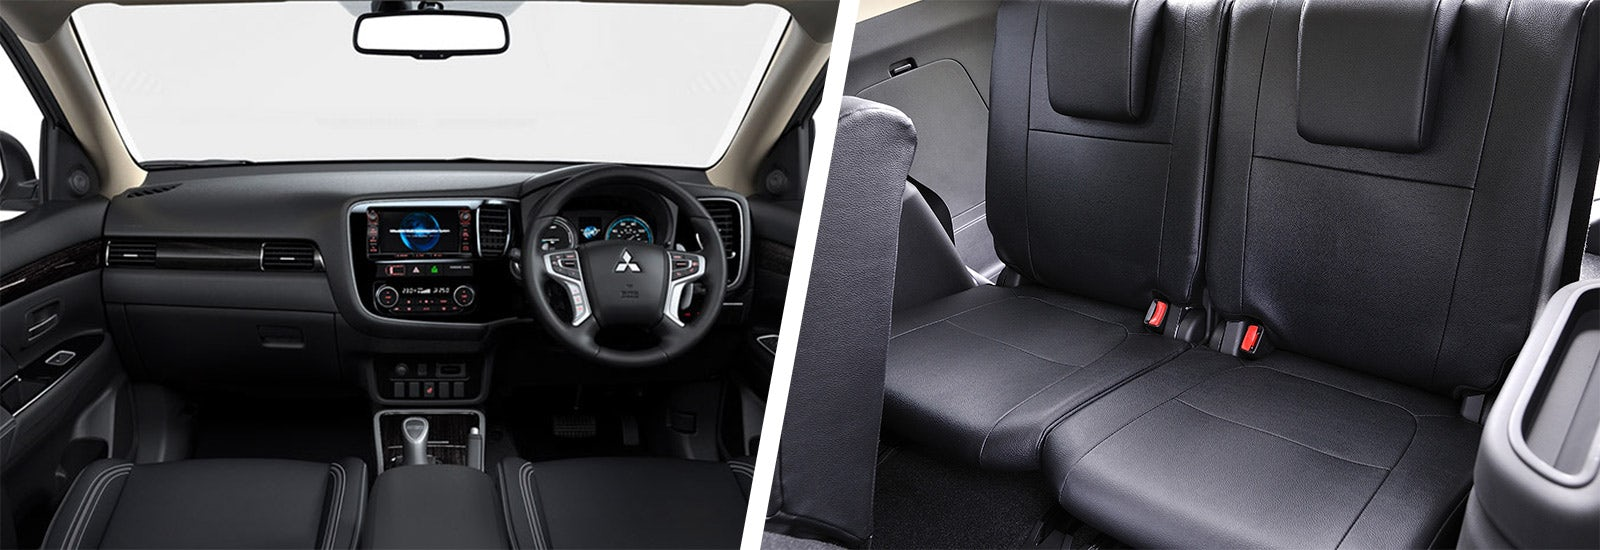 Mitsubishi Outlander & PHEV sizes & dimensions | carwow